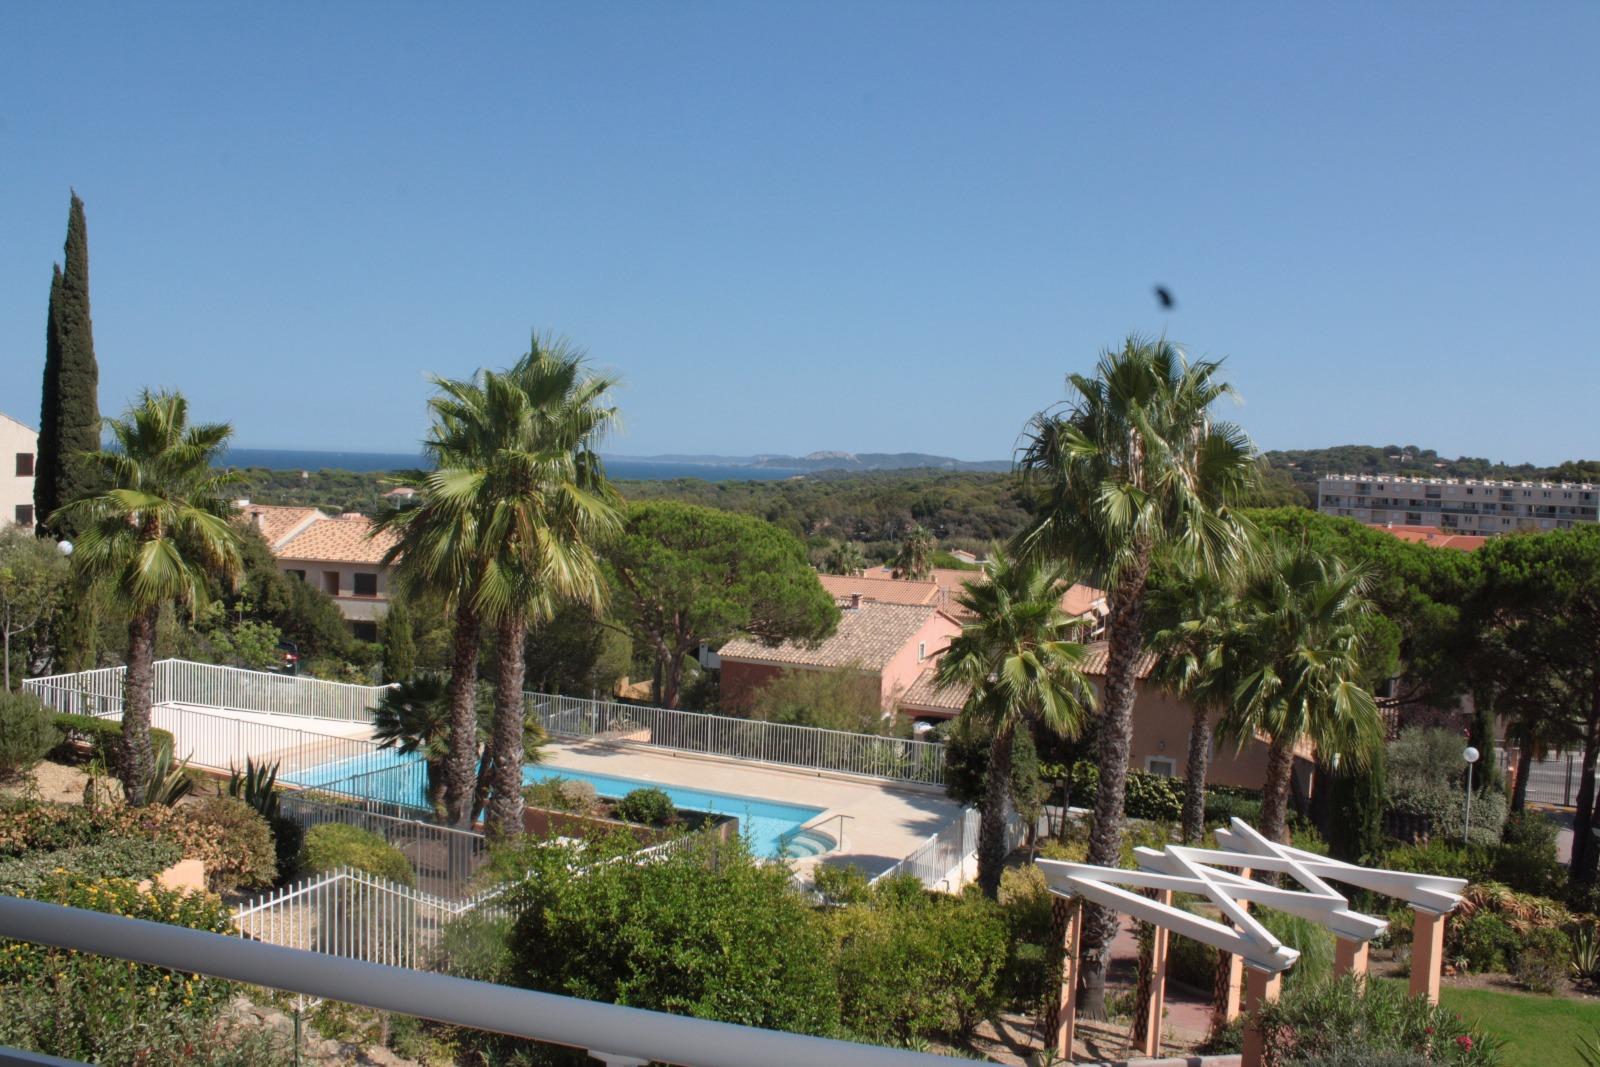 offres locations vacances location vacances hyeres appartement avec piscine. Black Bedroom Furniture Sets. Home Design Ideas